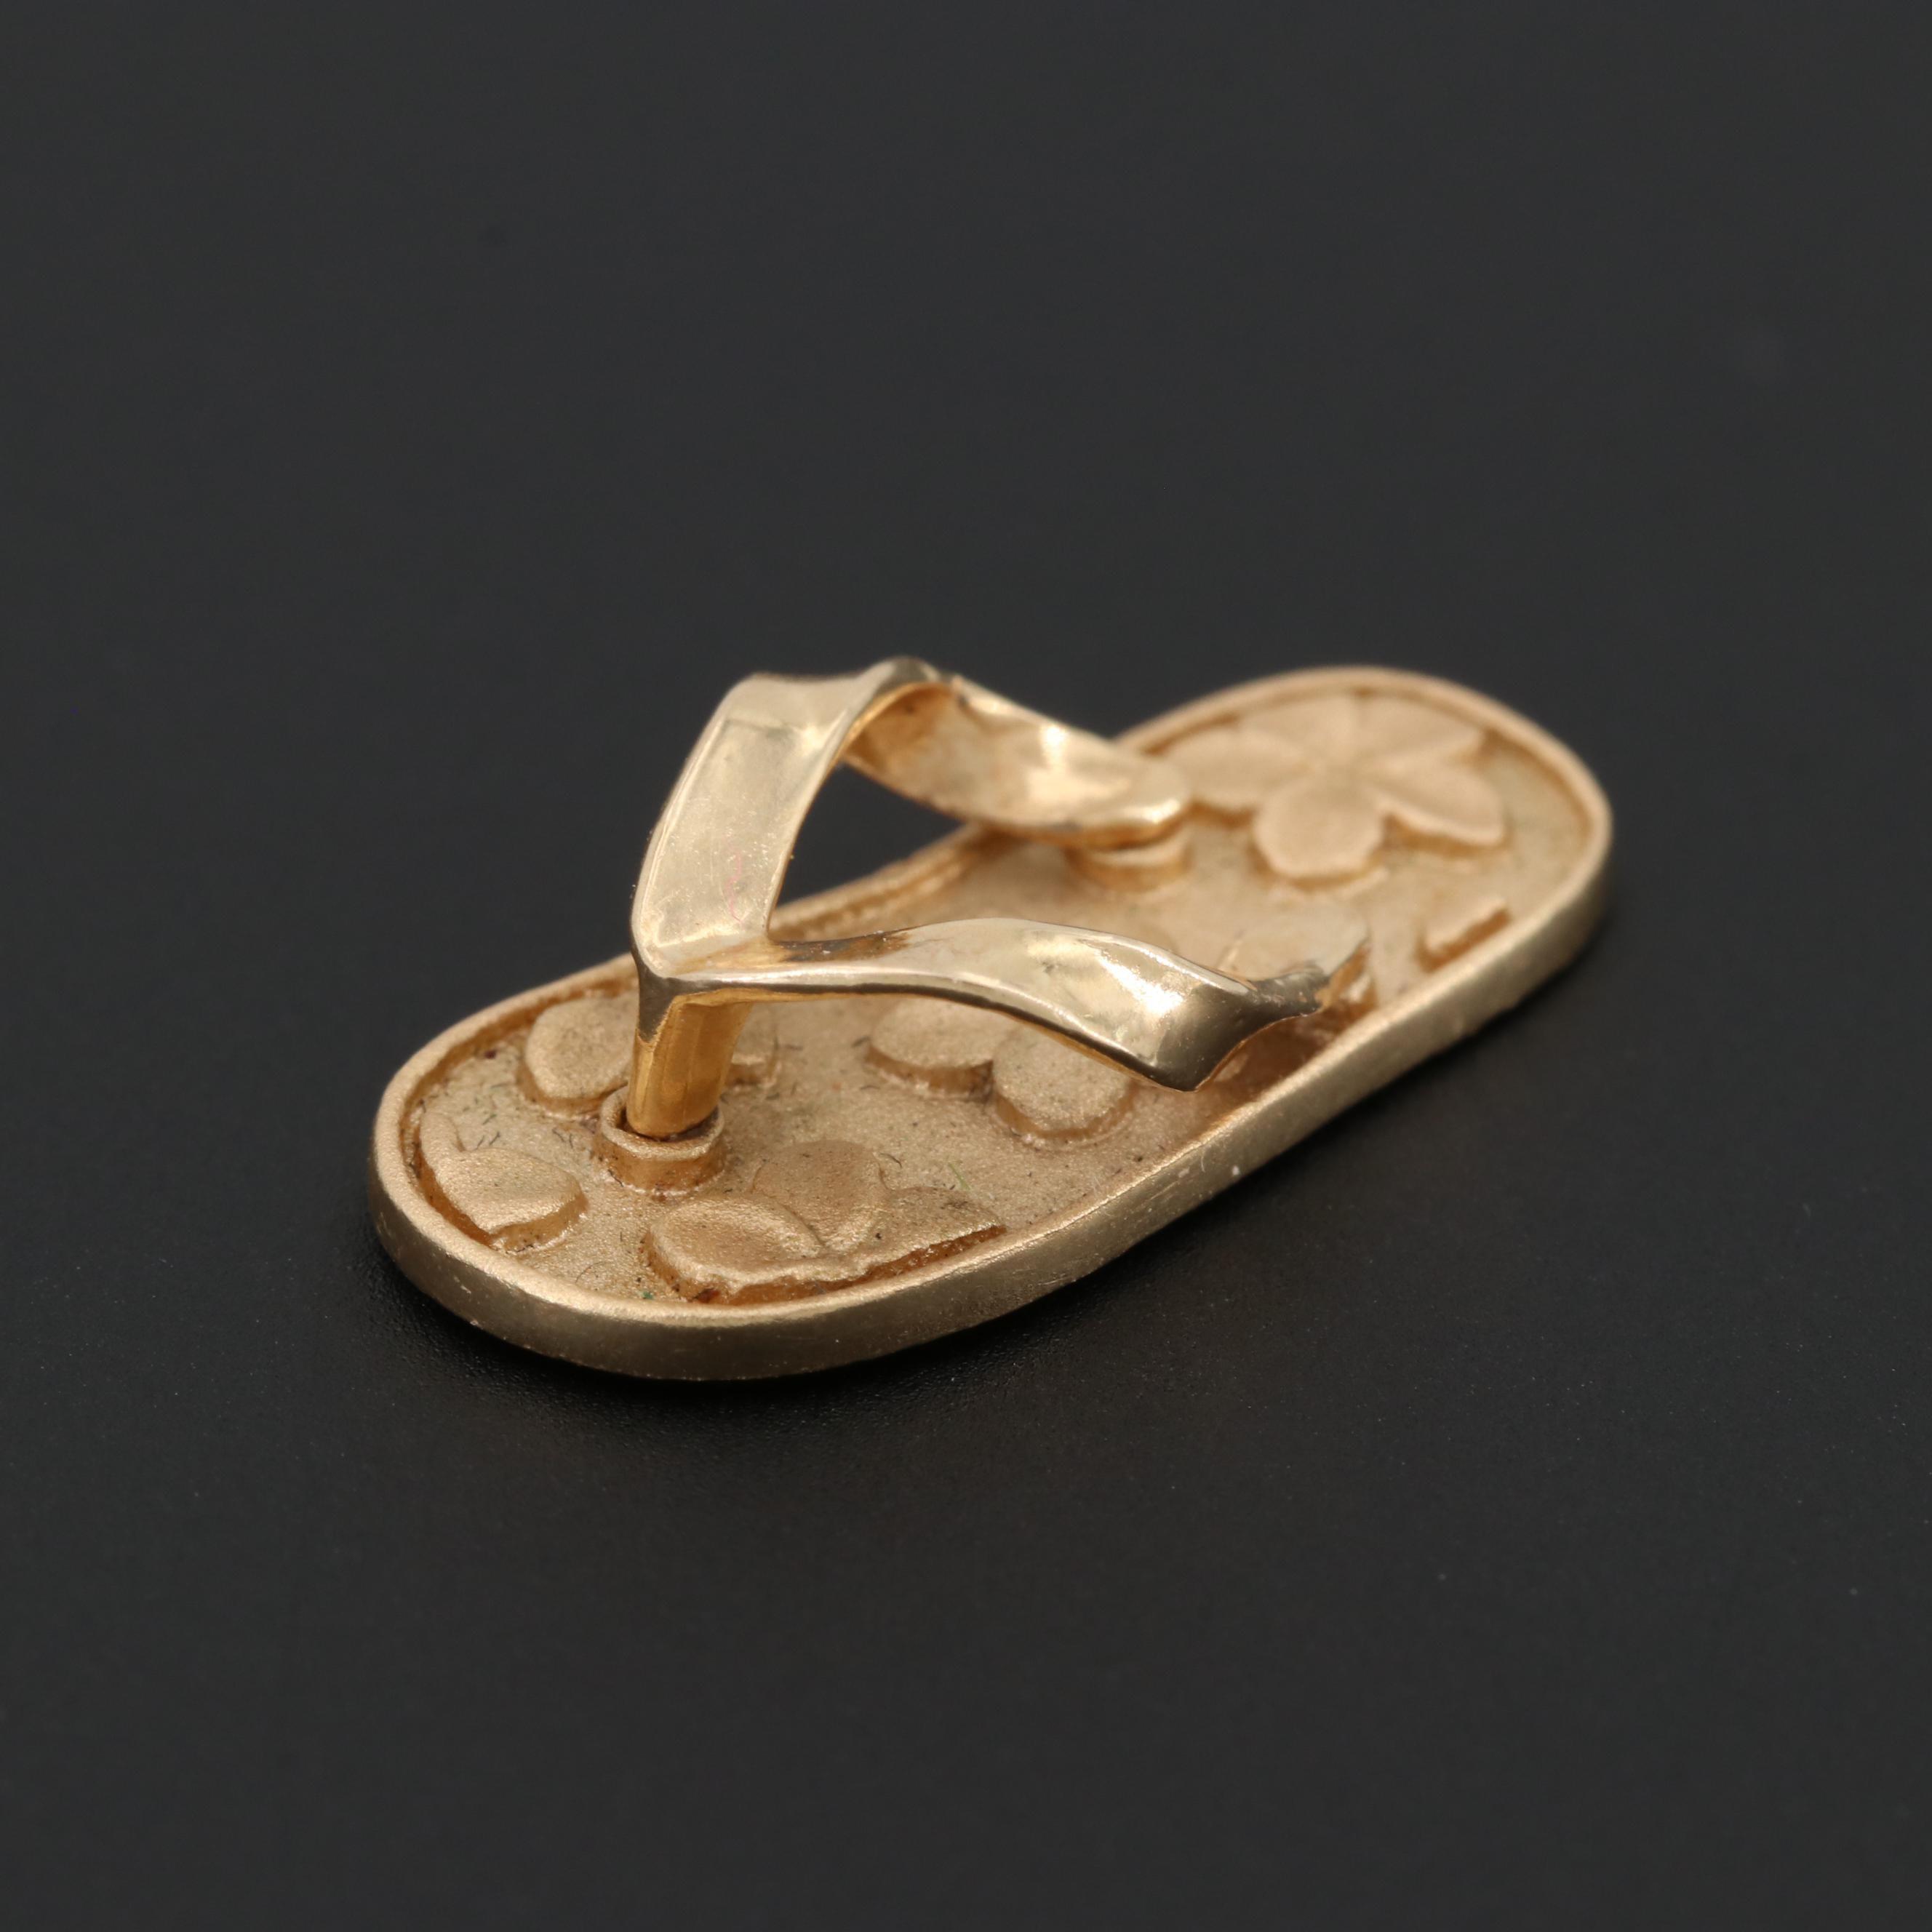 14K Yellow Gold Flip Flop Charm